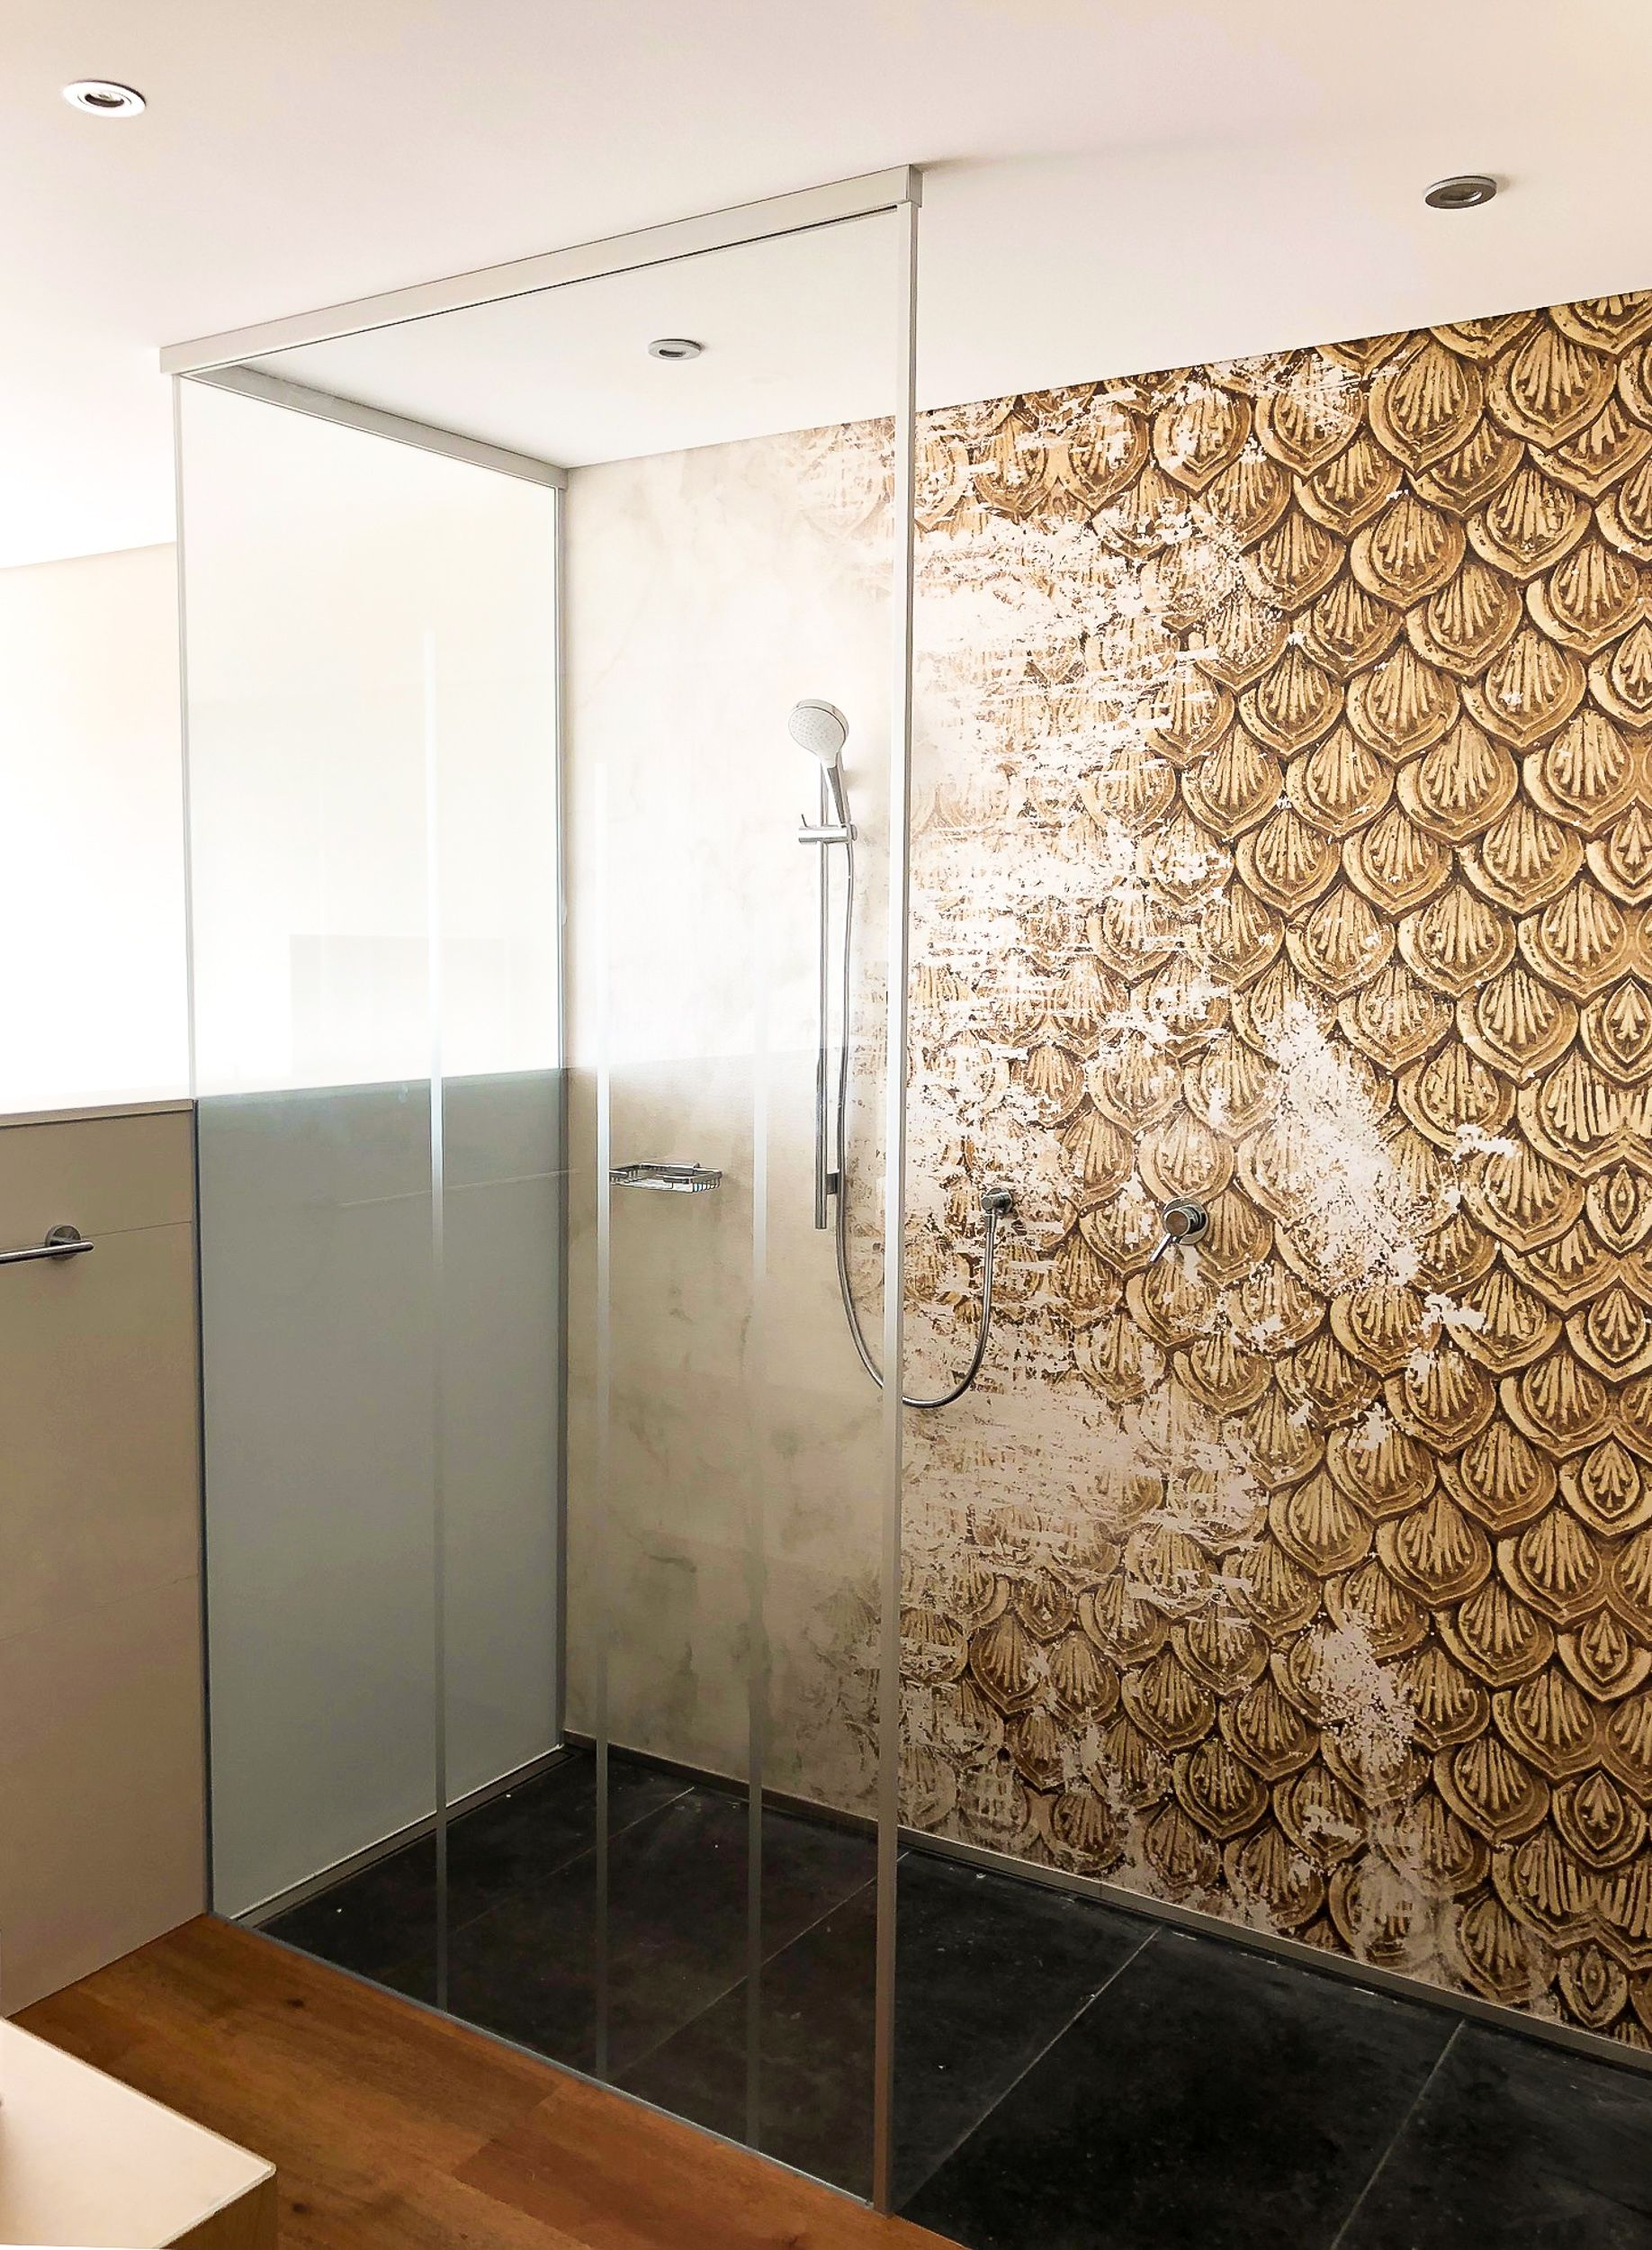 unikat Serie Glasduschen, Walk in dusche, Duschwand